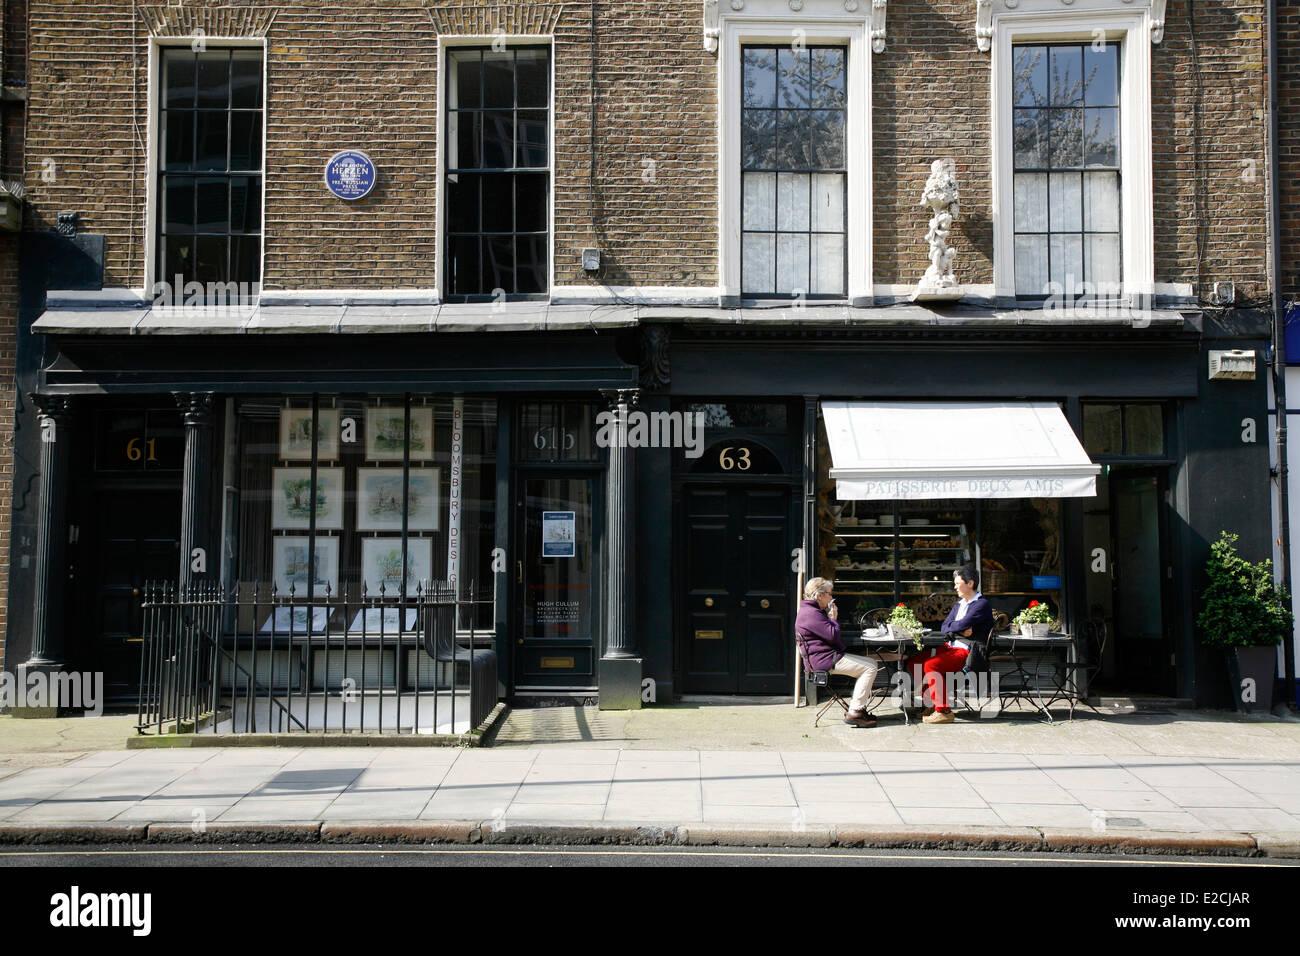 Patisserie Deux Amis on Judd Street, St Pancras, London, UK - Stock Image